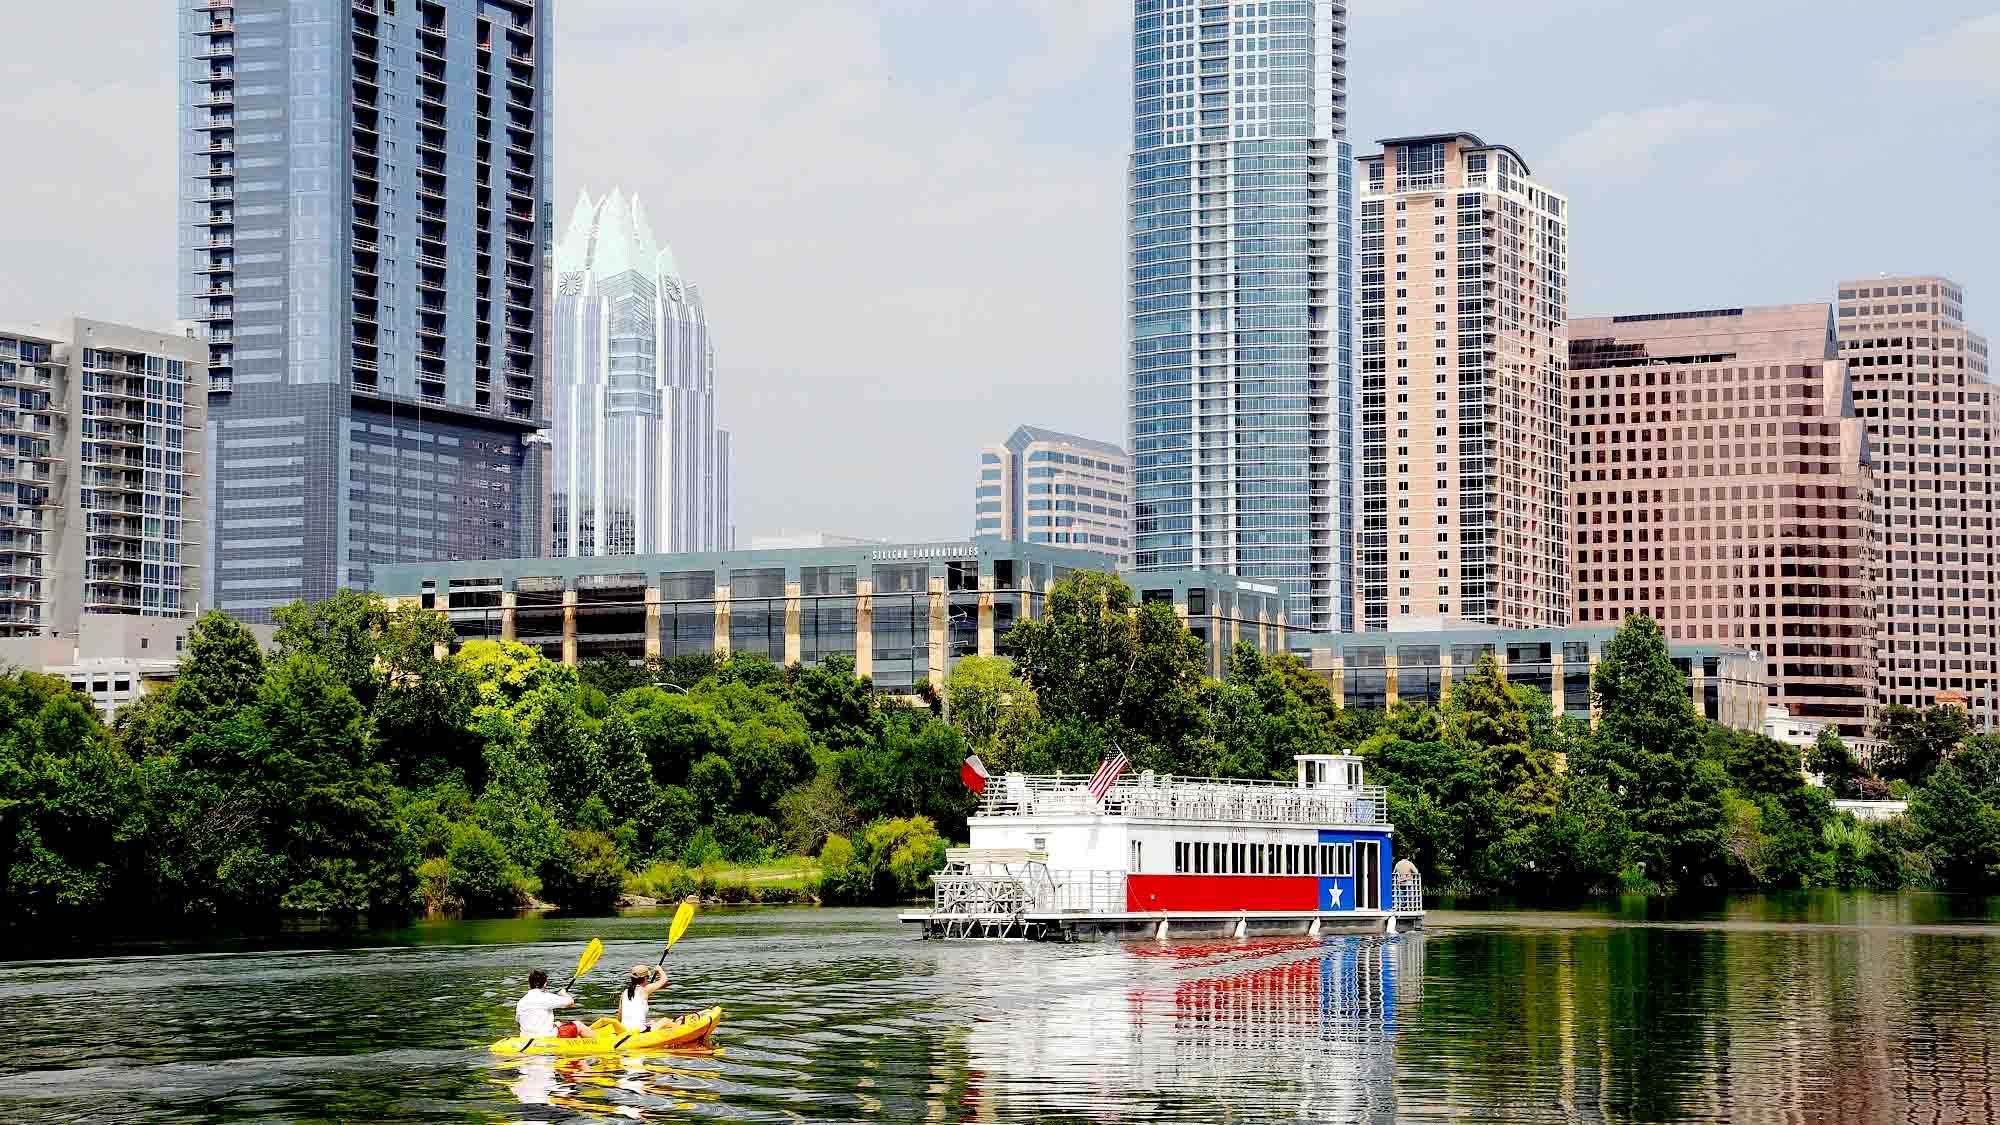 Austin paddle board kayak rentals with images kayak